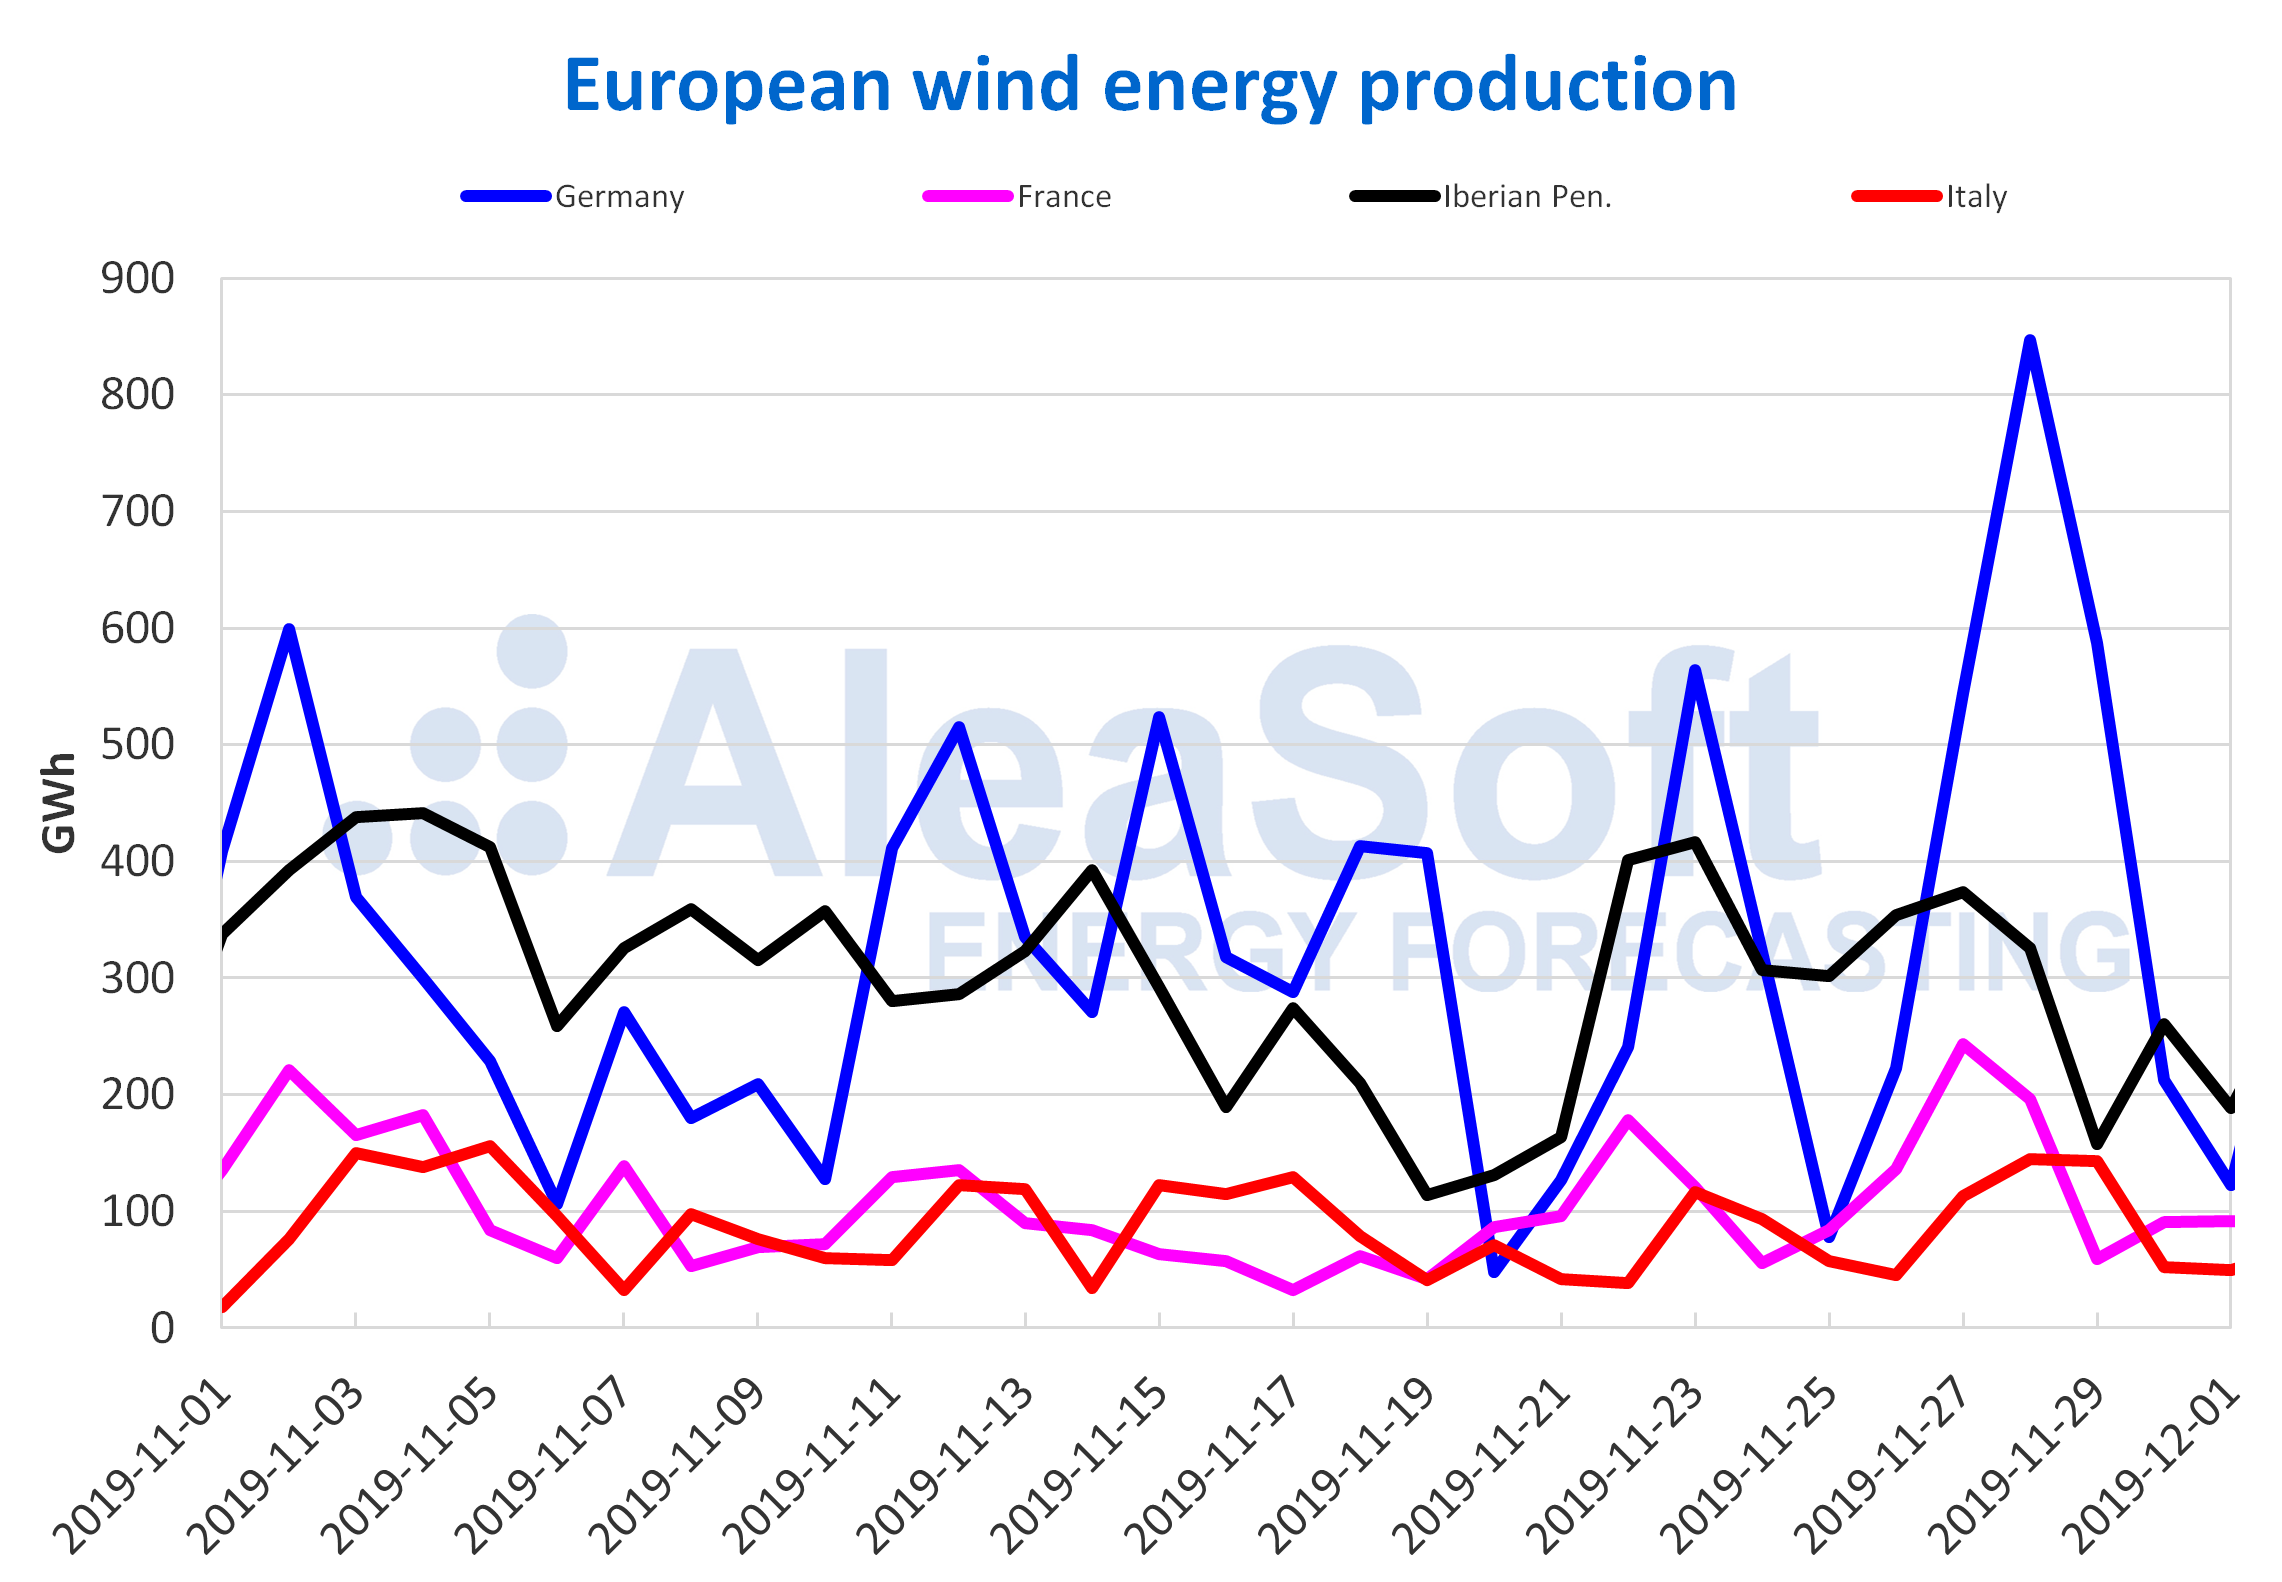 AleaSoft - European wind energy production